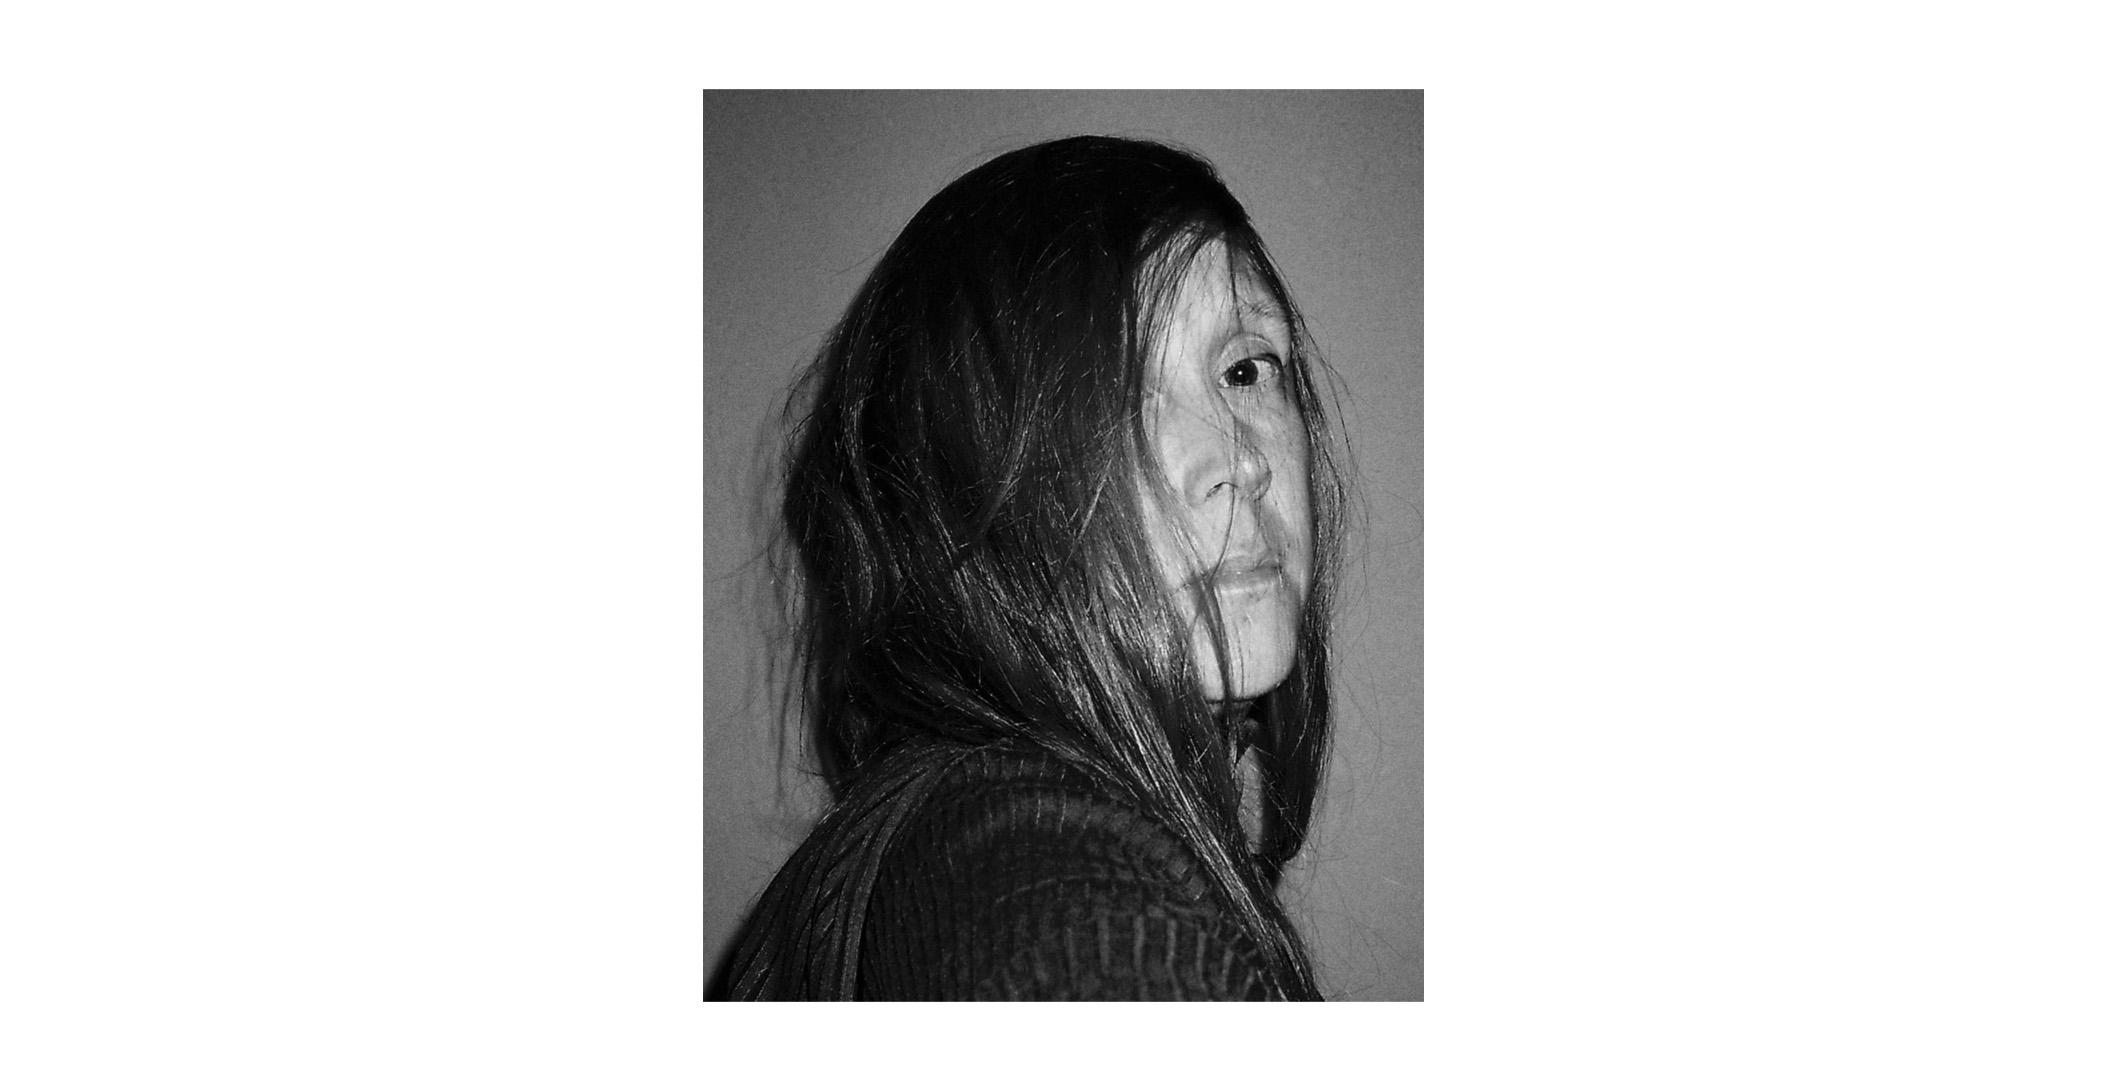 Lique Schoot, Self-portrait 17 10 21